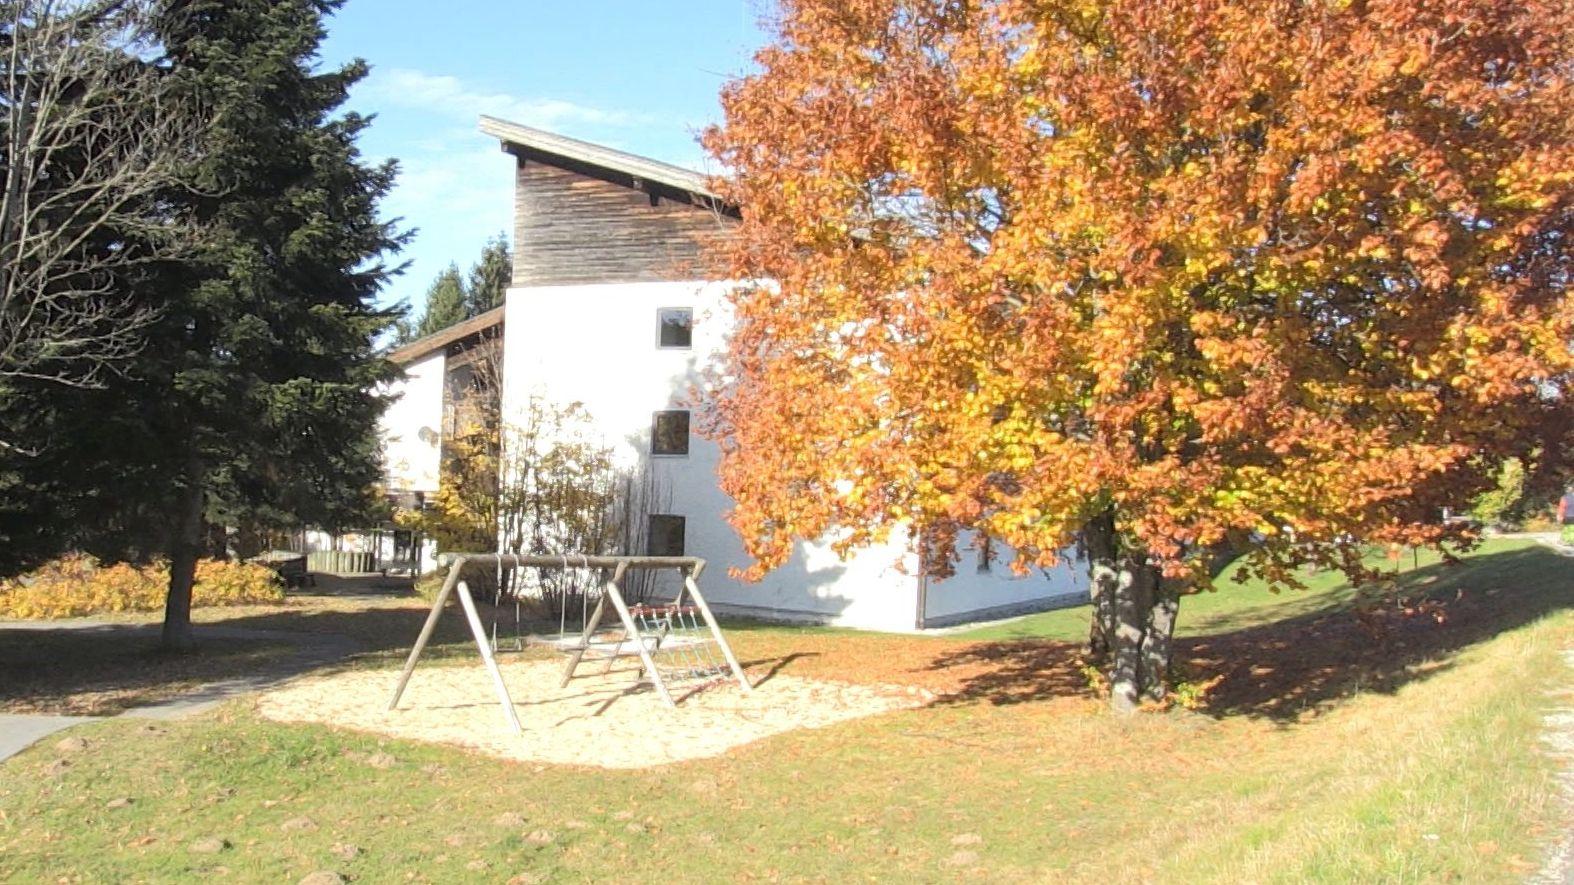 Die Jugendherberge in Haidmühle muss Ende Oktober 2020 schließen